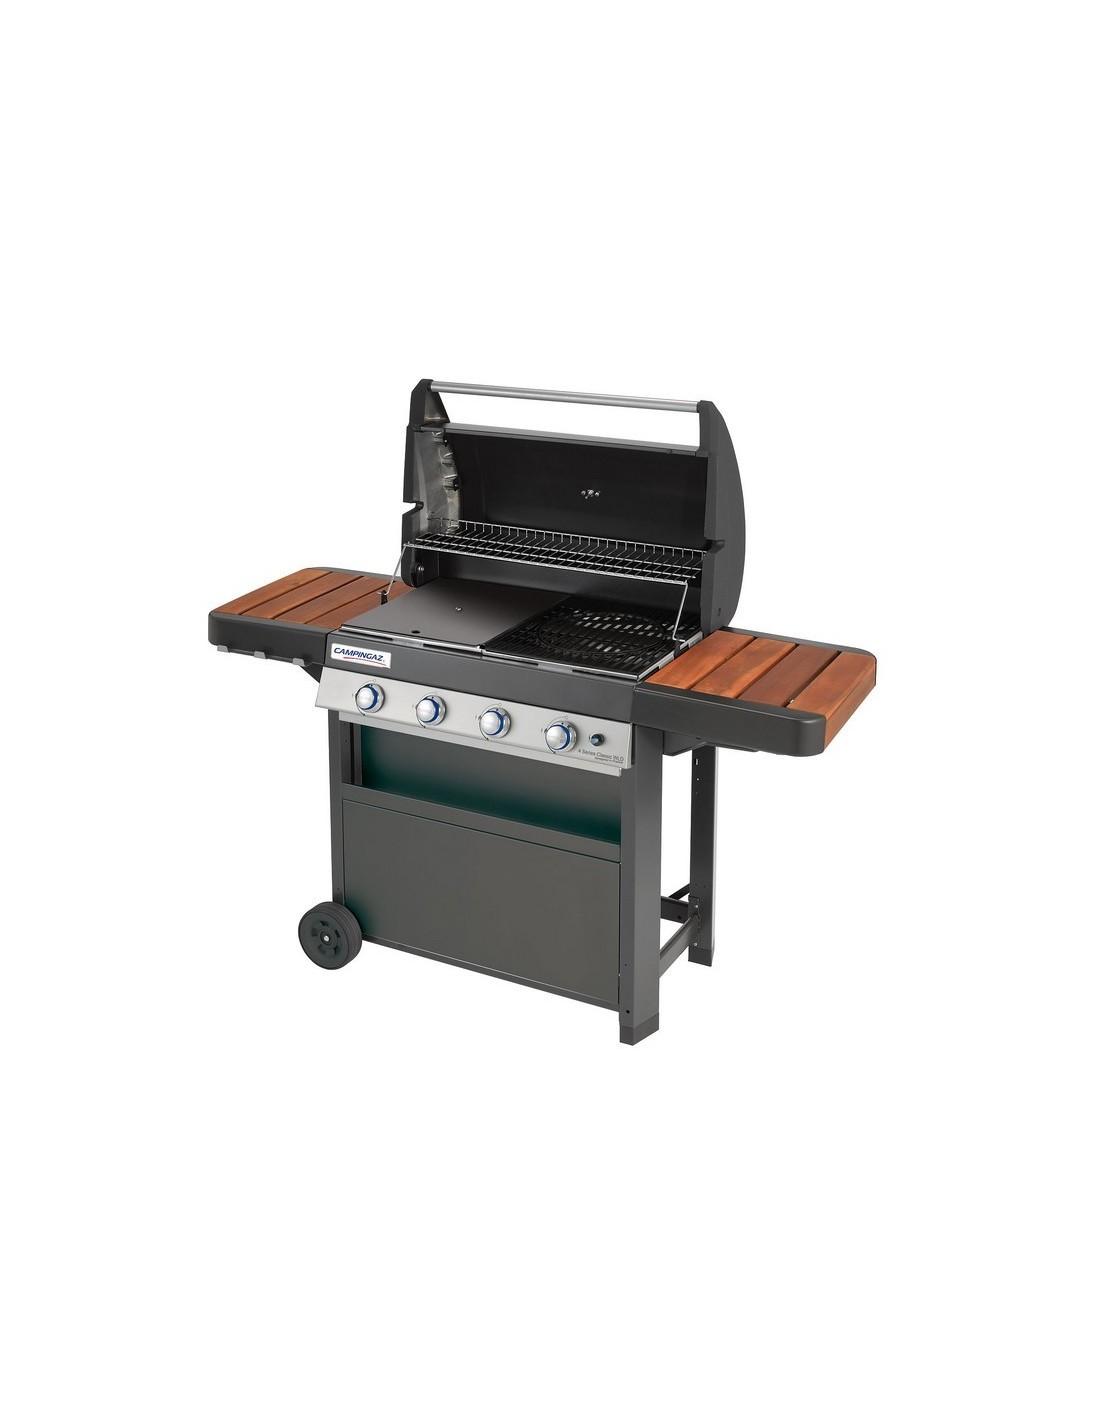 Barbecue Gaz Et Plancha barbecue gaz campingaz 4 series classic wld - serres et abris